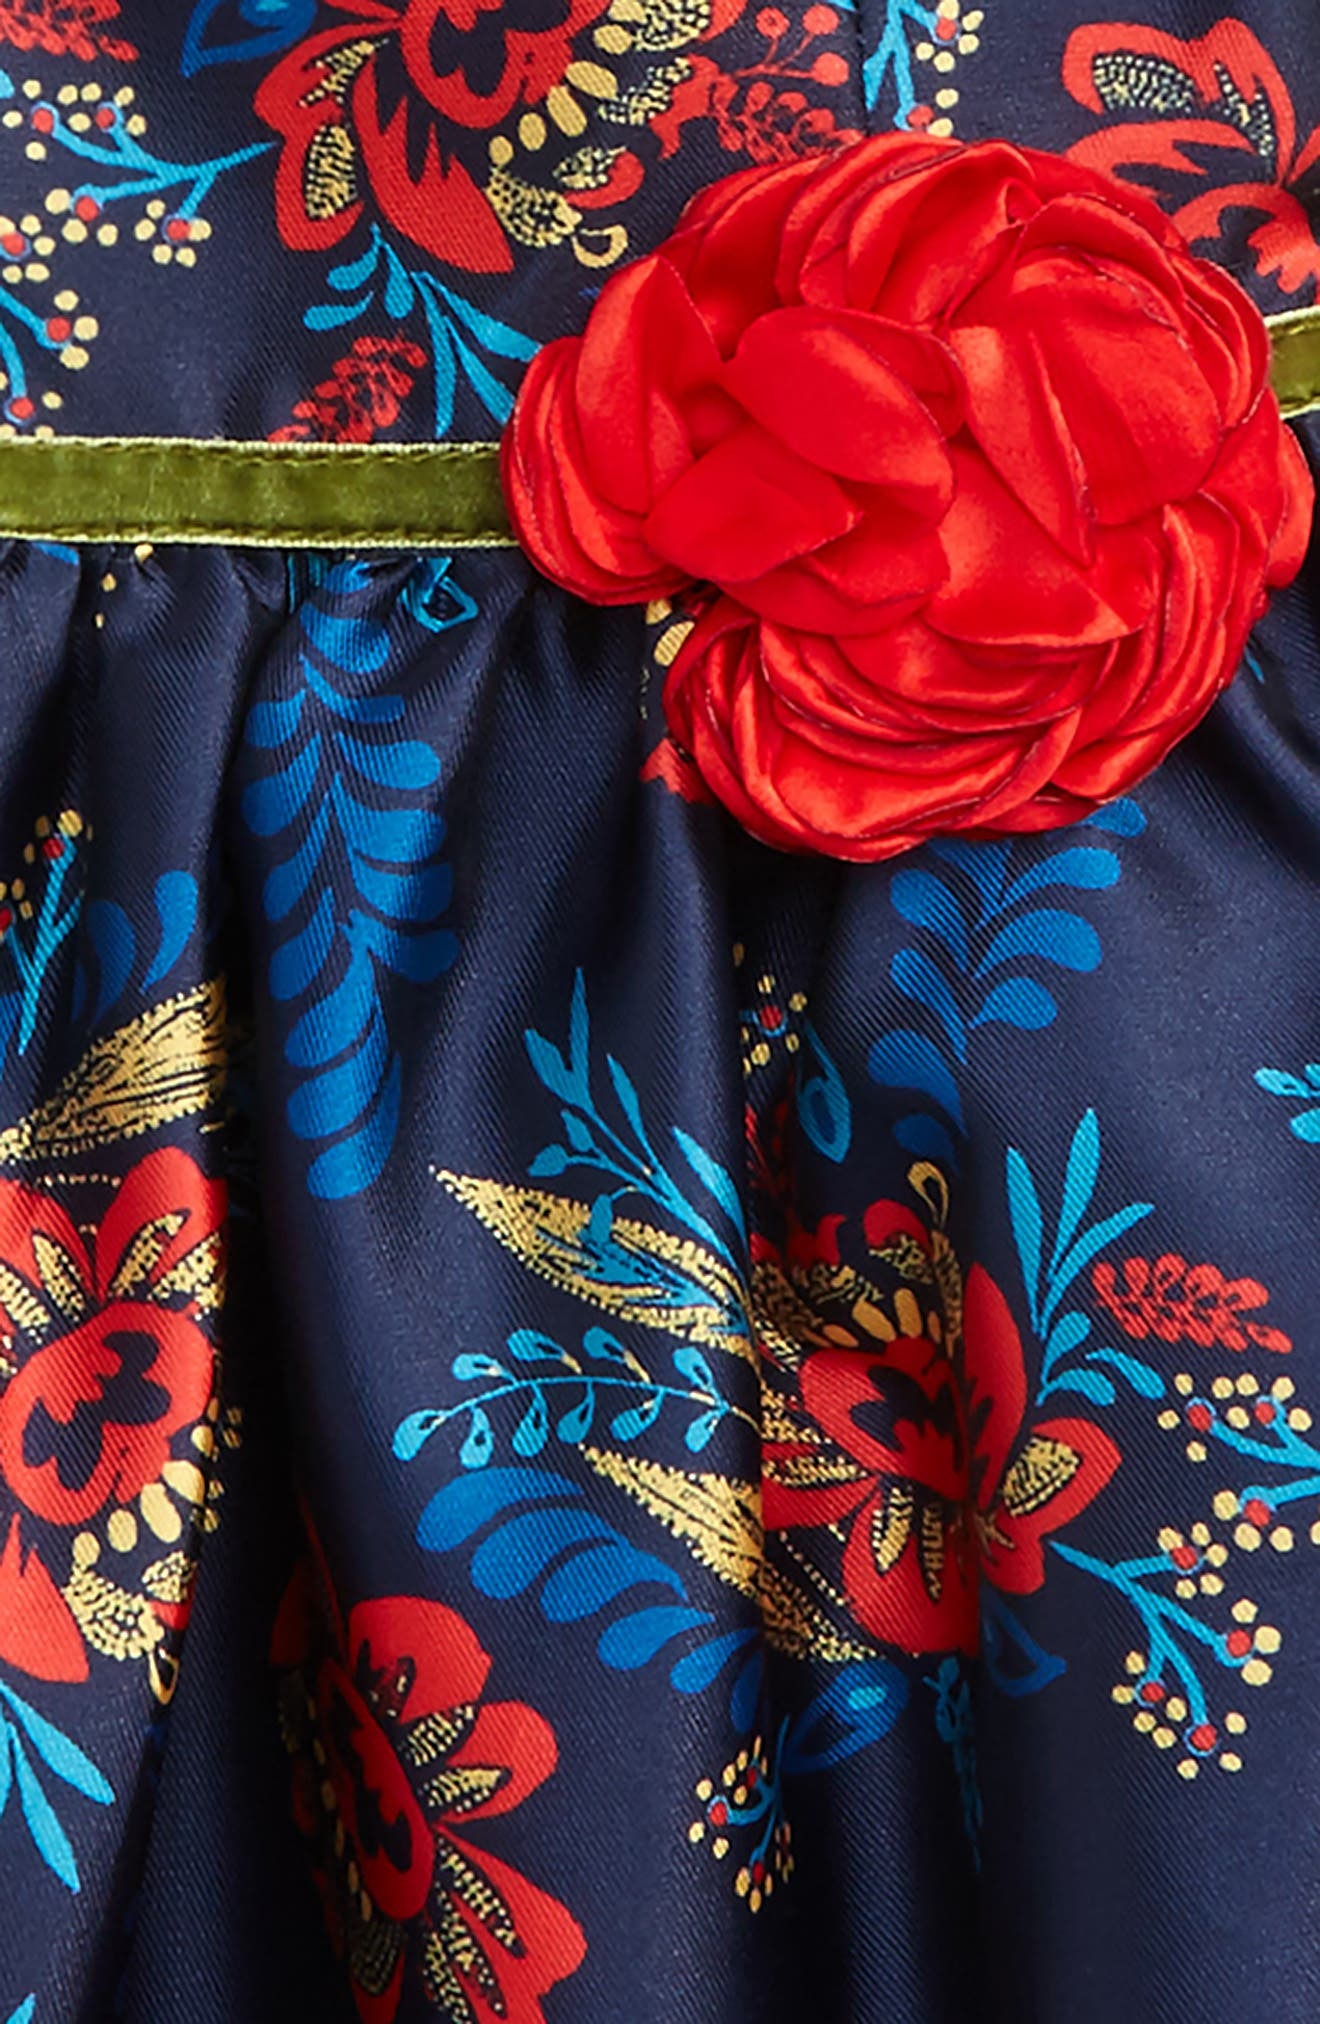 Floral Print Fit & Flare Dress,                             Alternate thumbnail 2, color,                             Navy